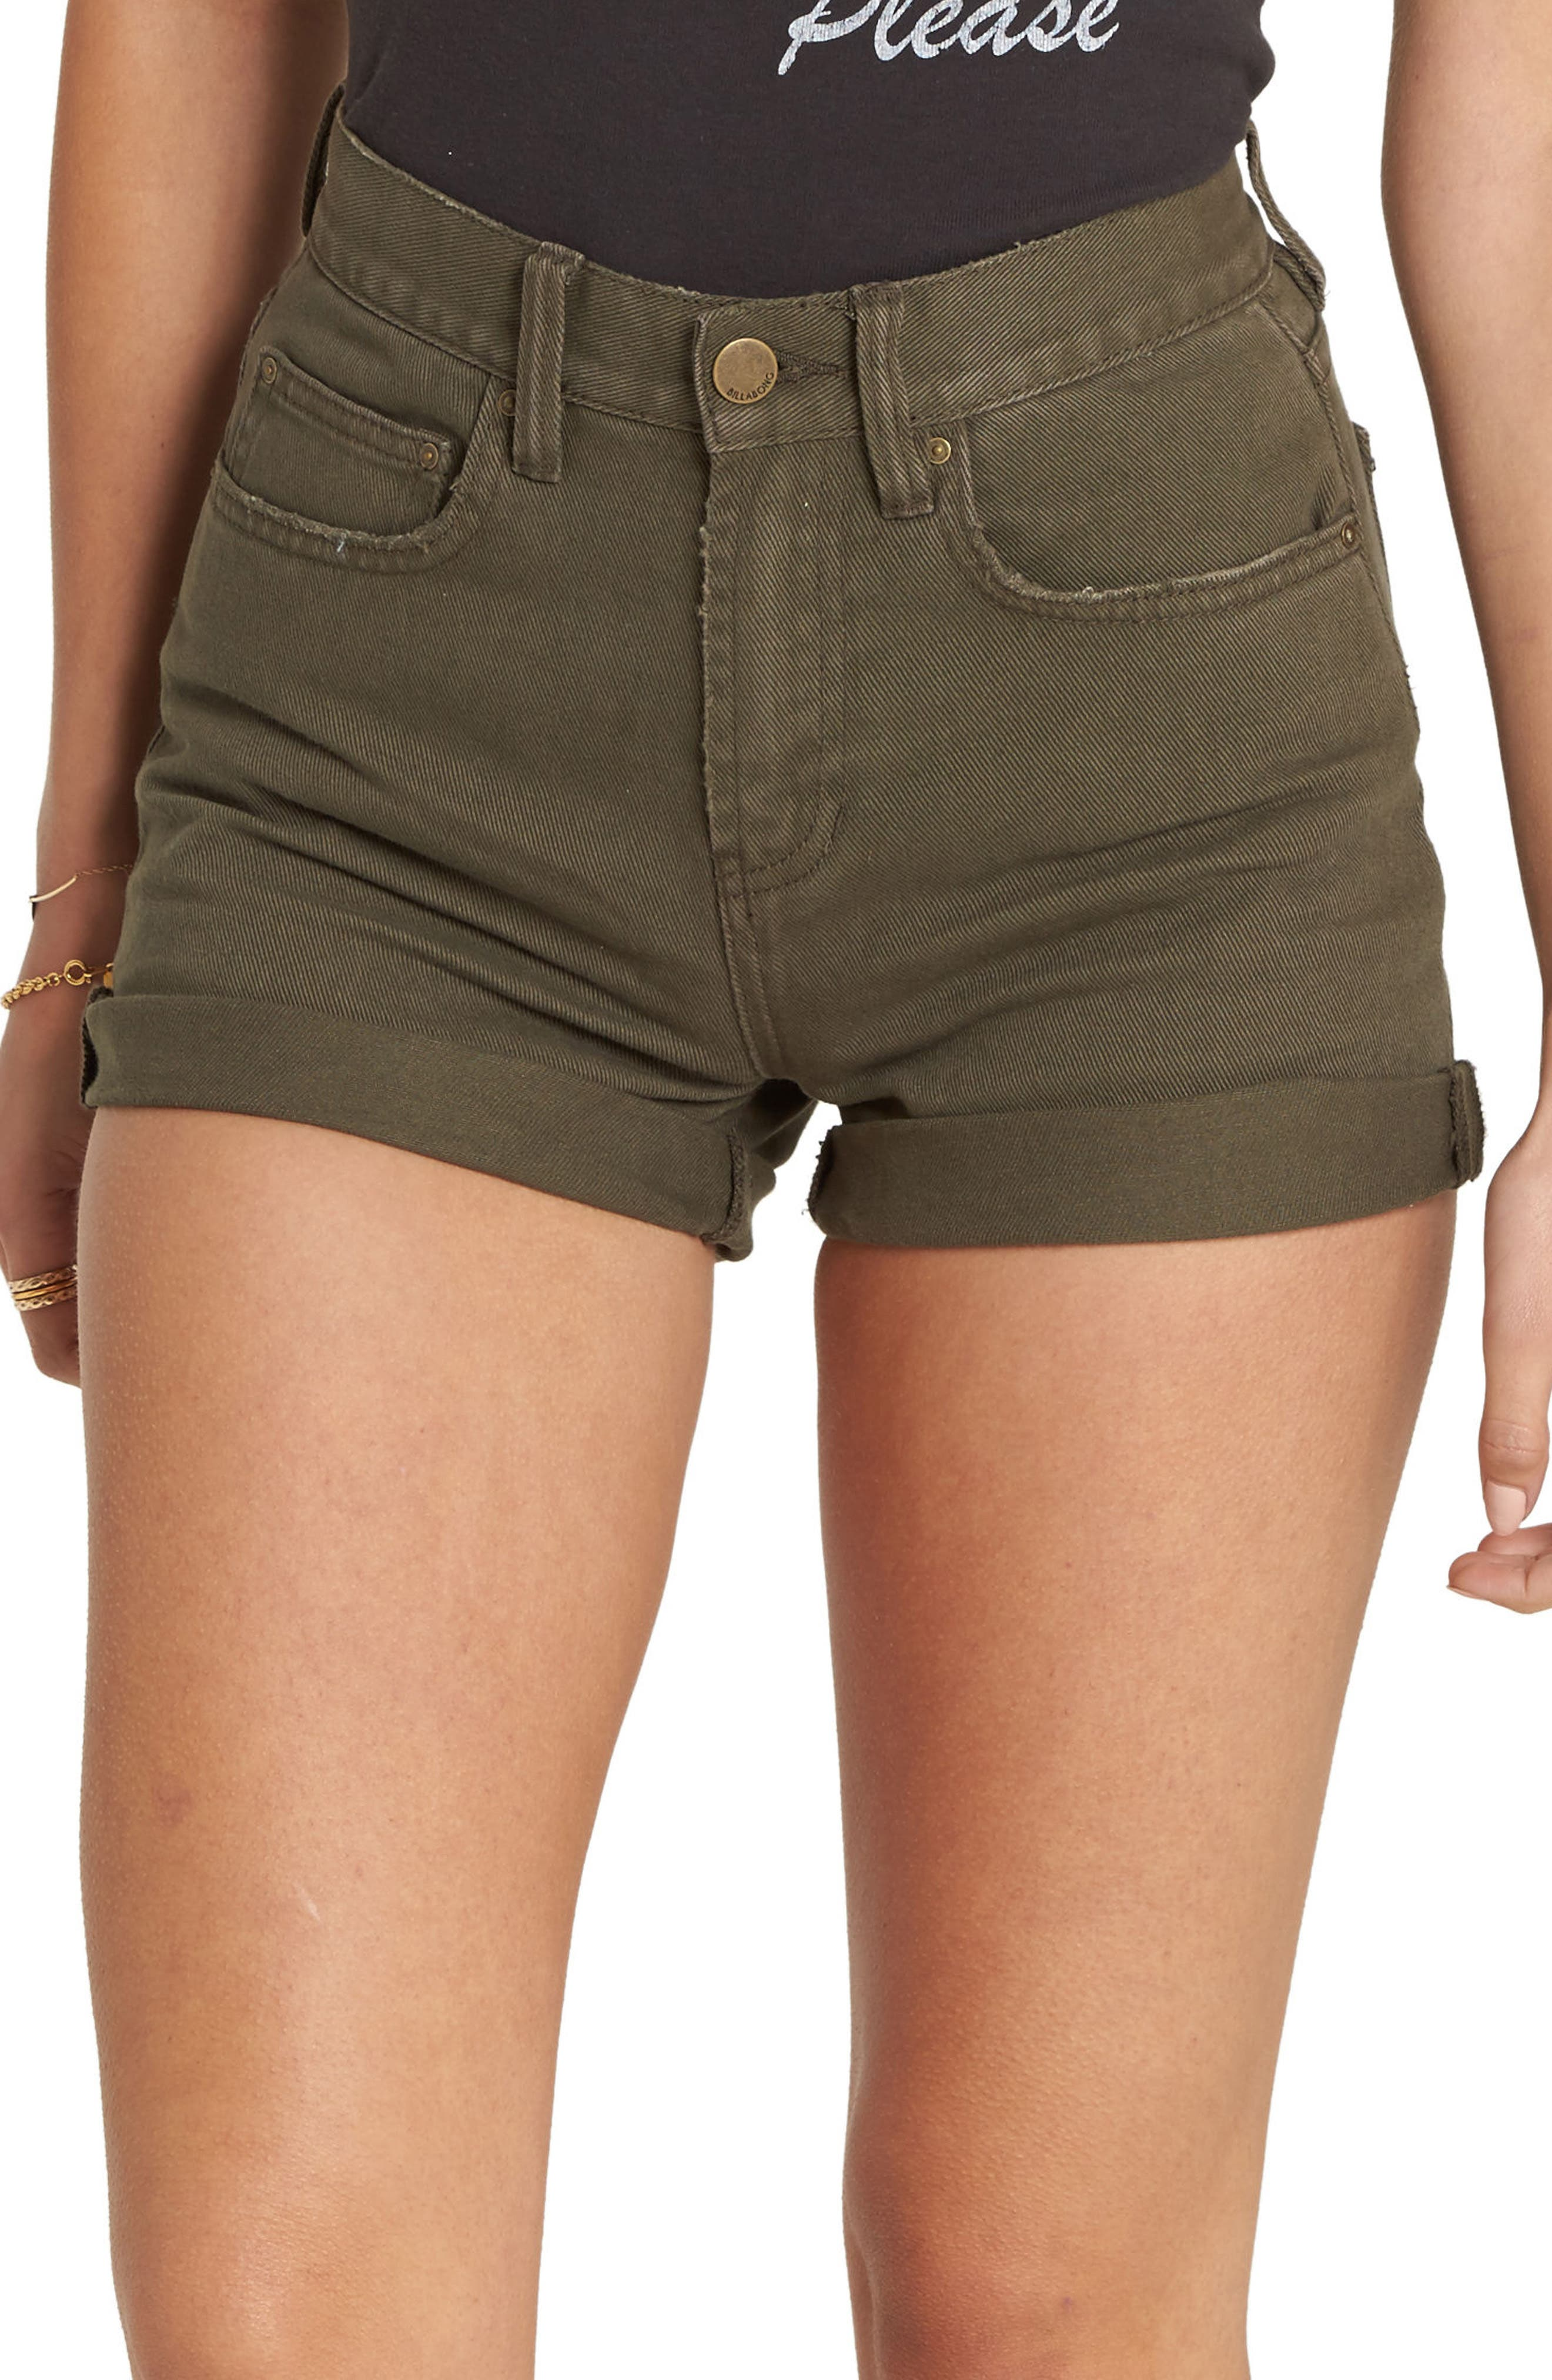 High Tide Denim Shorts,                             Main thumbnail 1, color,                             Olive